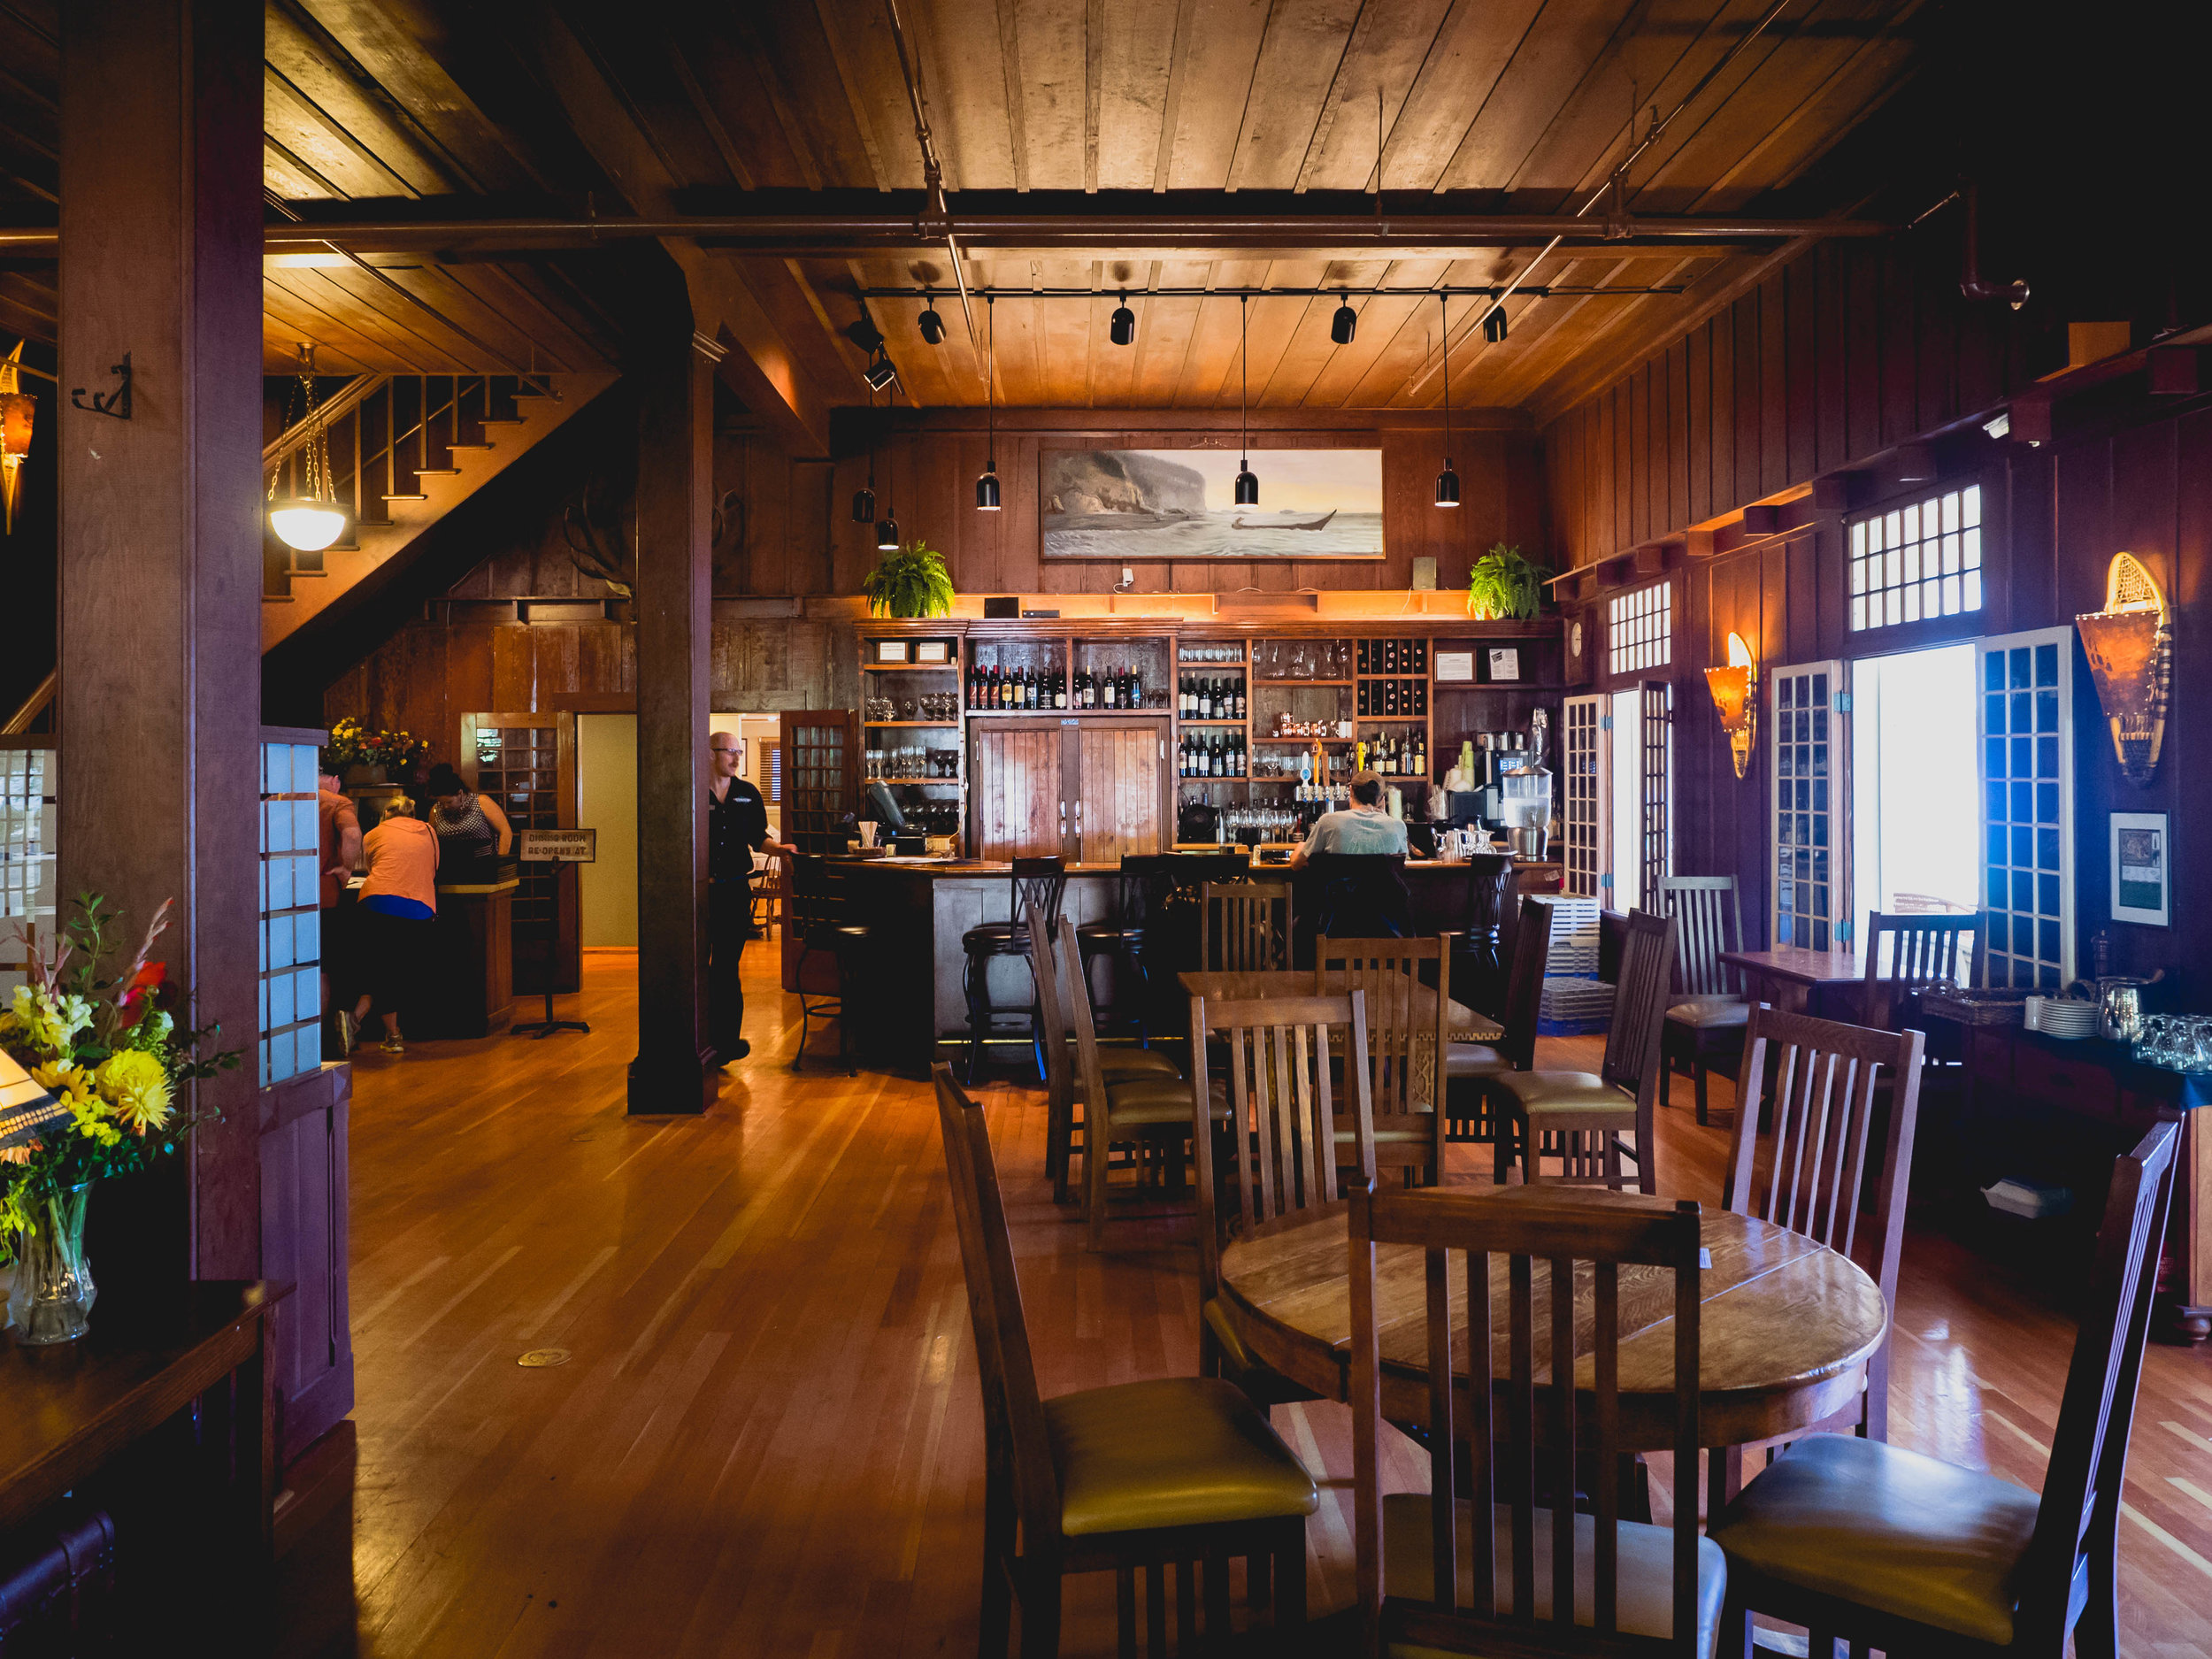 the bar inside crescent lake lodge.